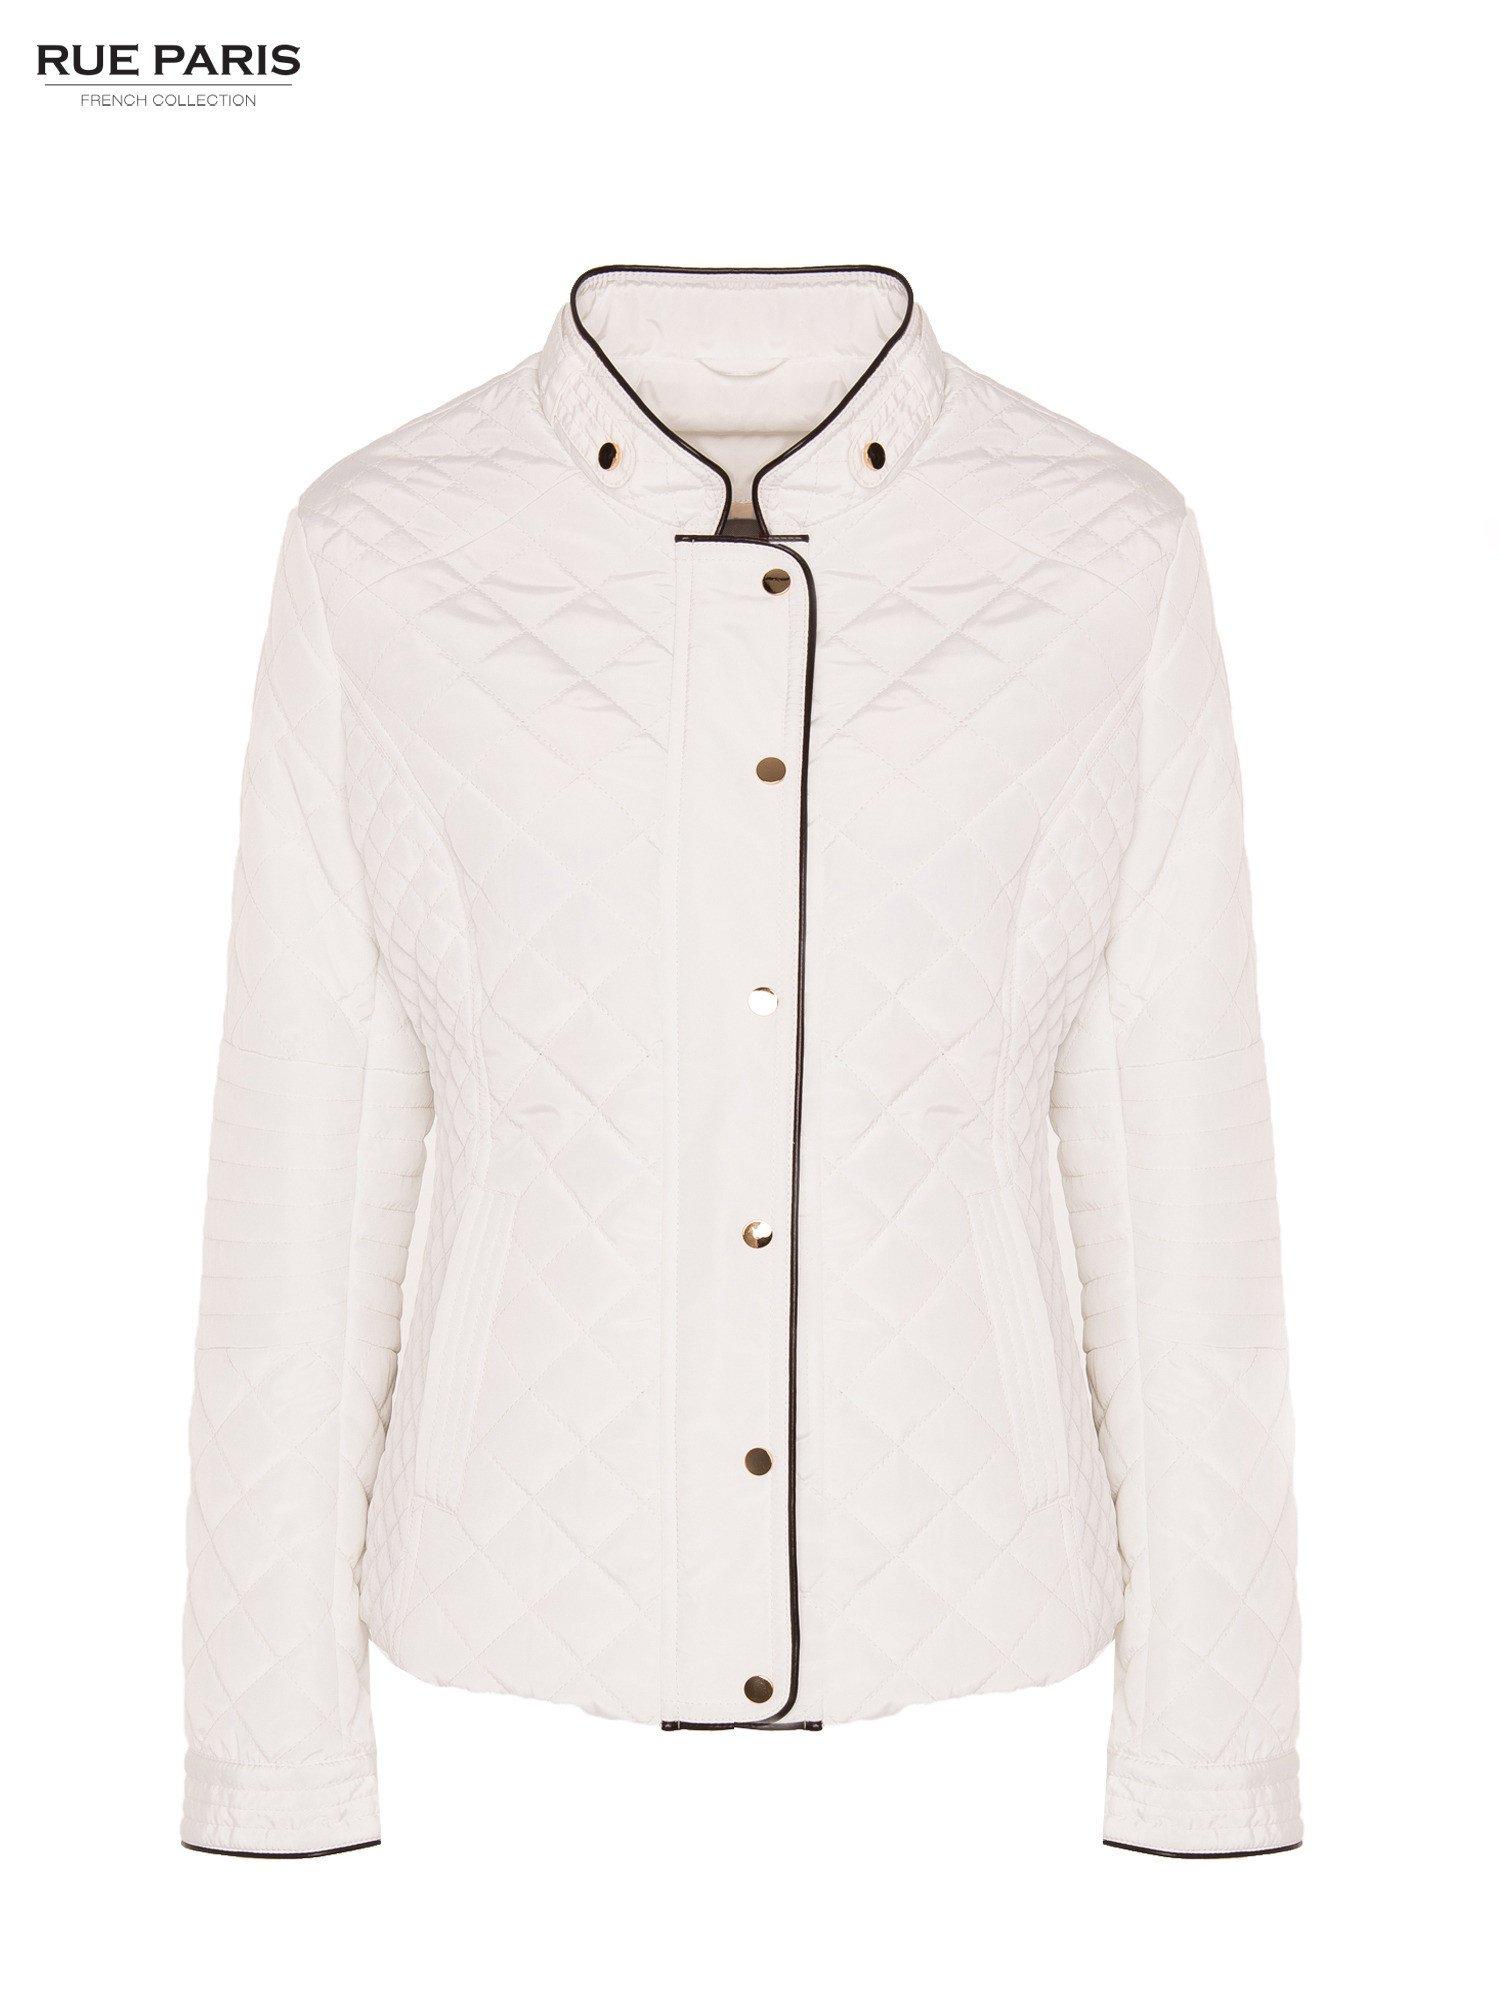 Biała pikowana kurtka ze skórzaną lamówką                                  zdj.                                  5